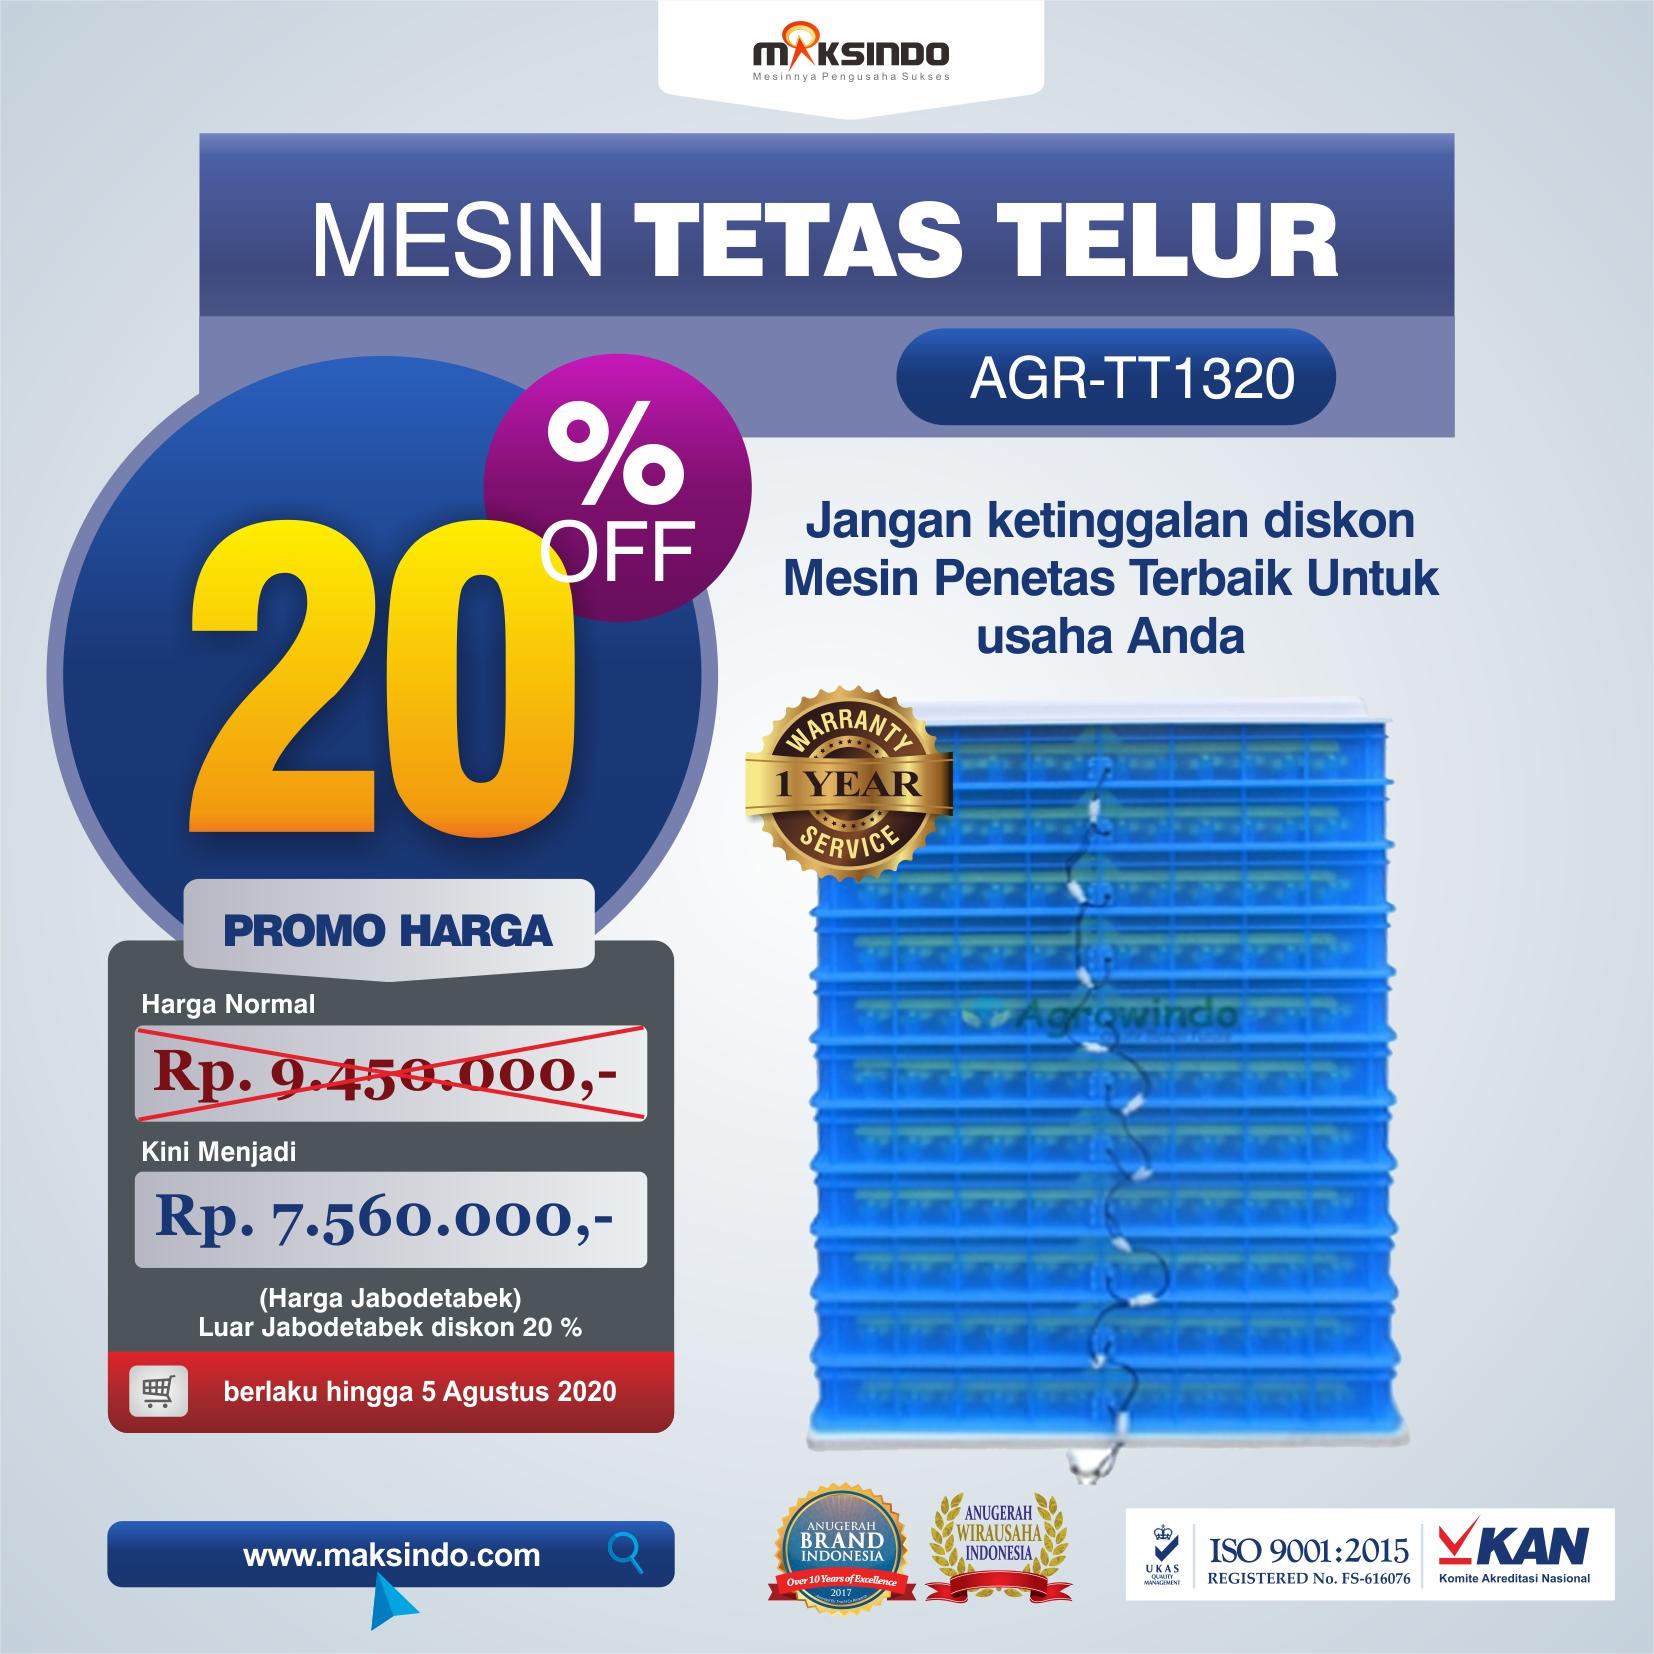 AGR-TT1320 MESIN TETAS TELUR